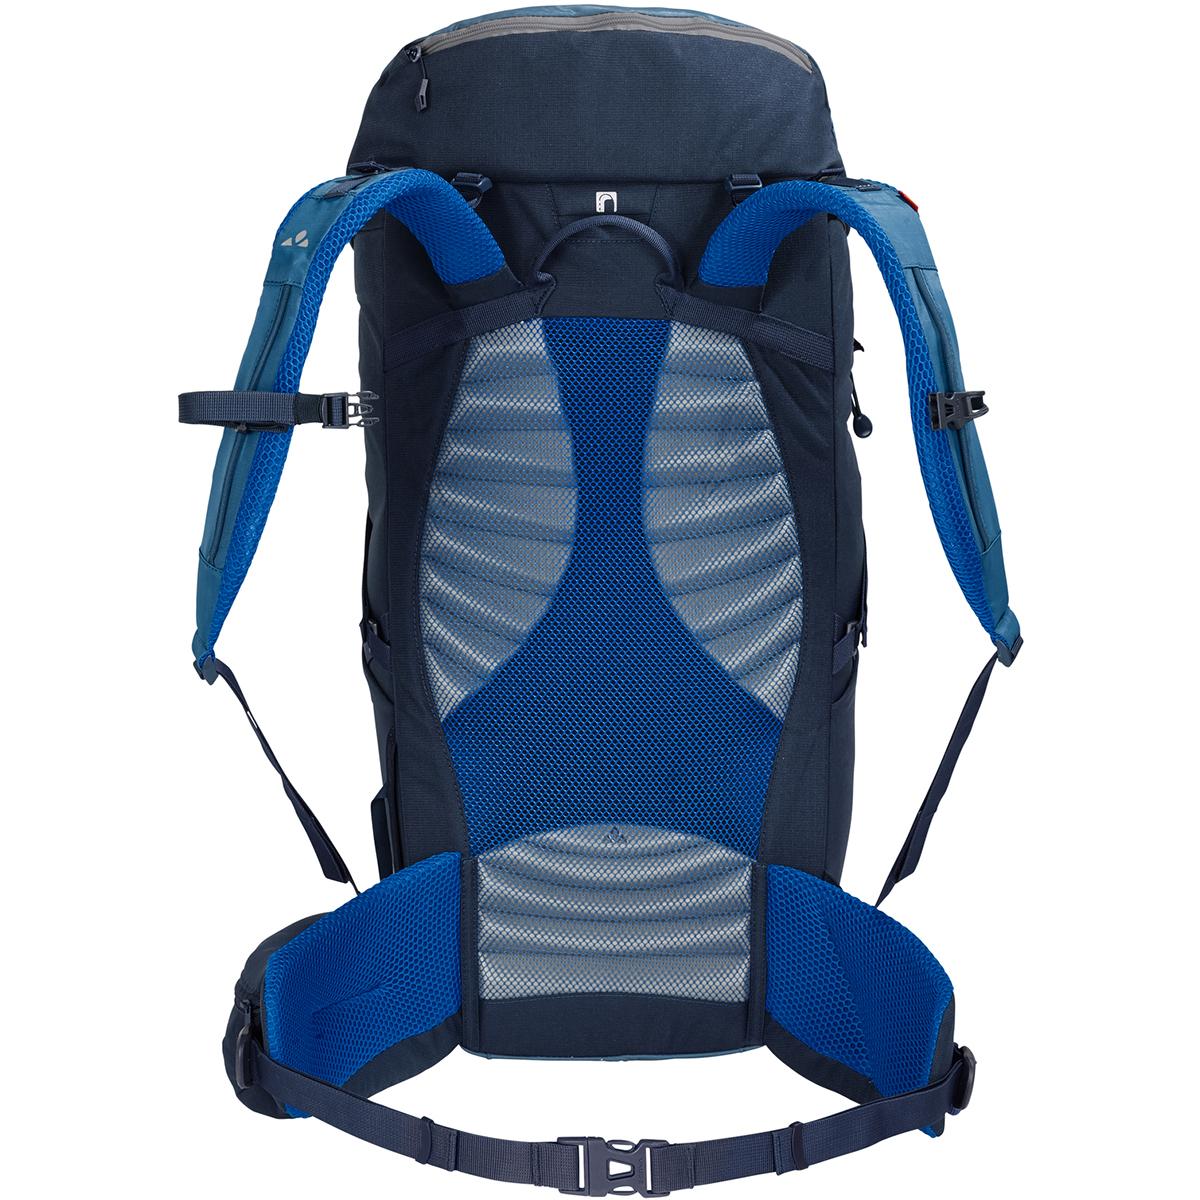 Vaude-Prokyon-30-L-Hiking-Backpack thumbnail 5